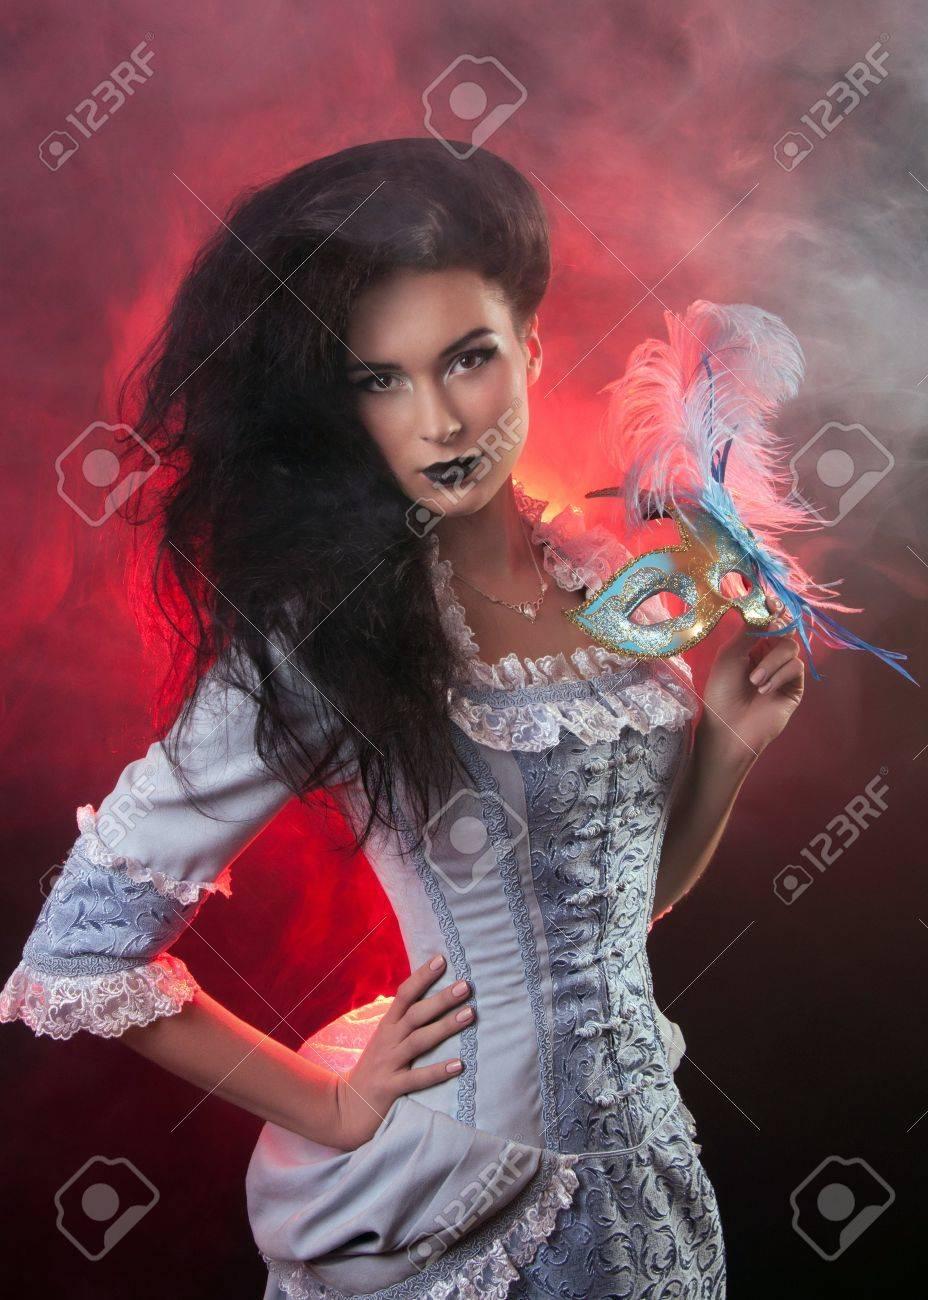 Beautiful Halloween Vampire Woman Aristocrat With Venetian Mask ...